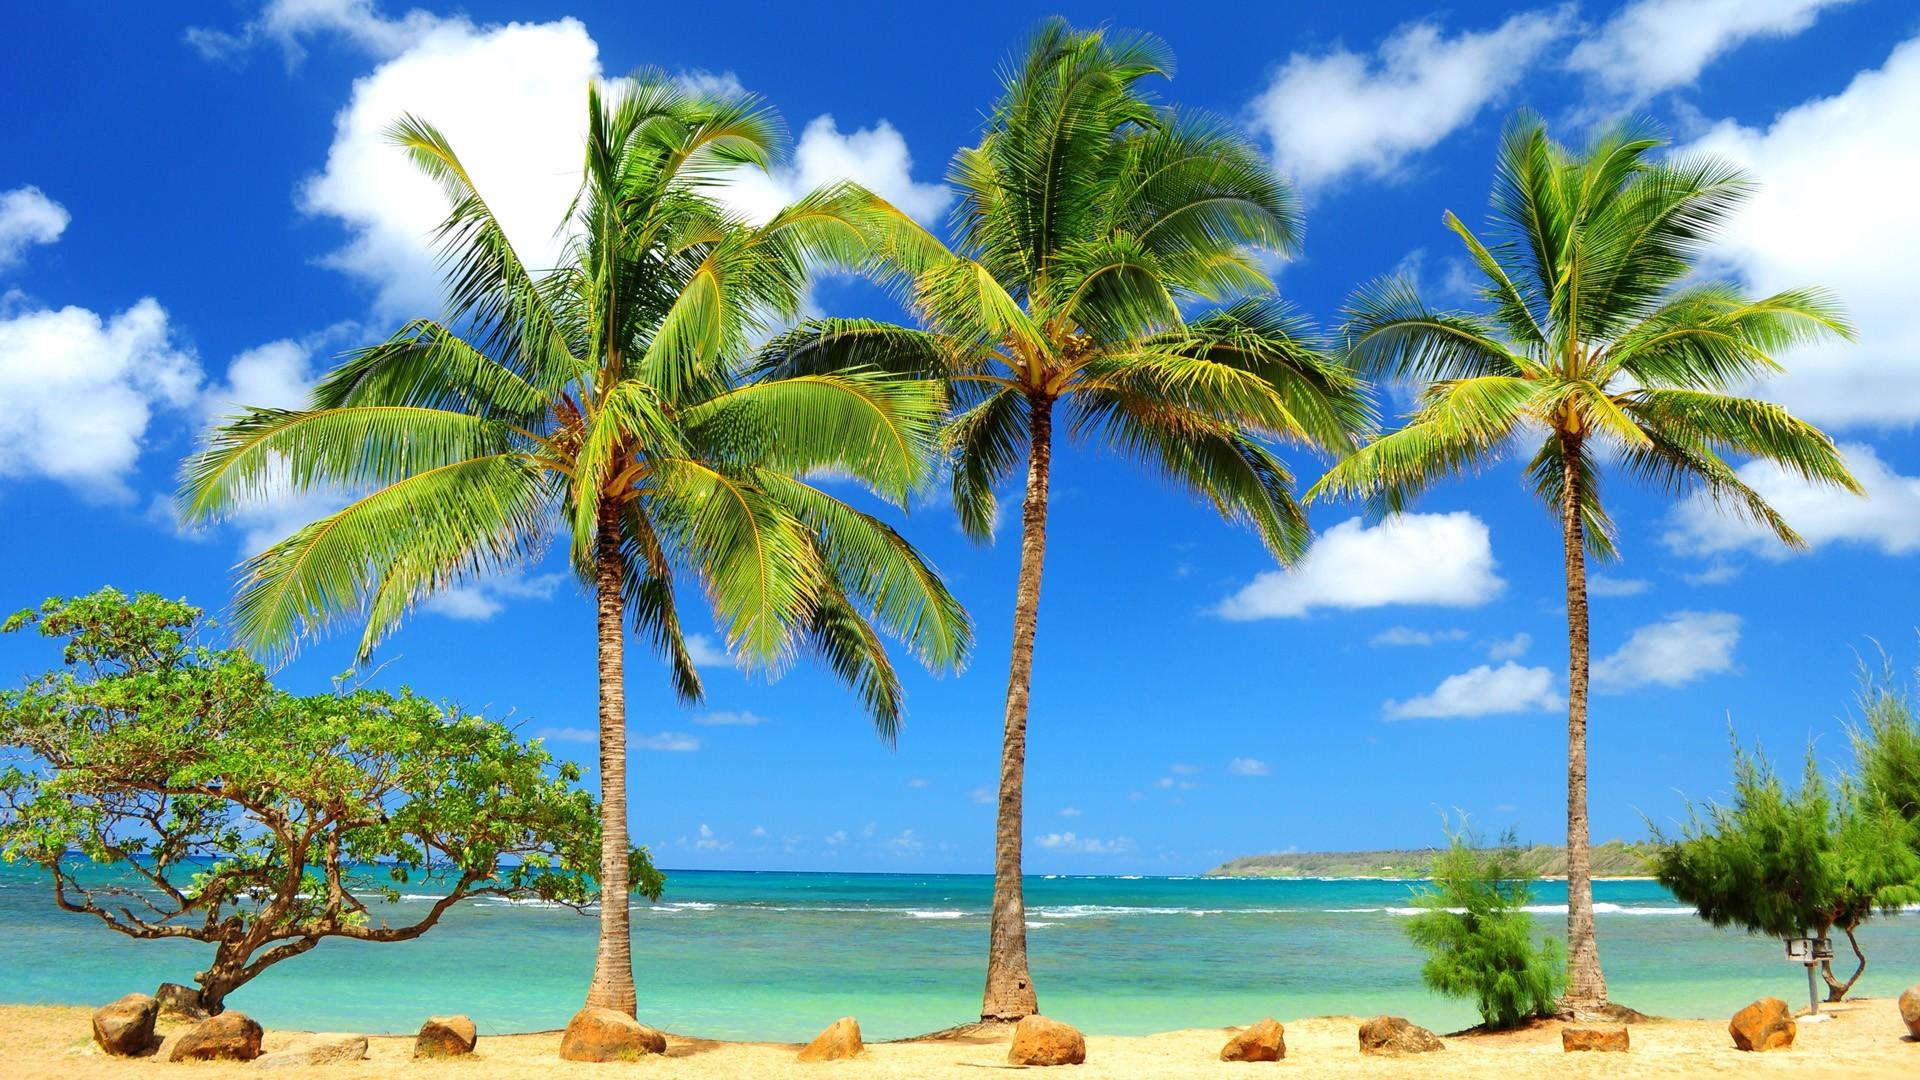 Palms in Kauai Hawaii wallpaper 2935 1920x1080